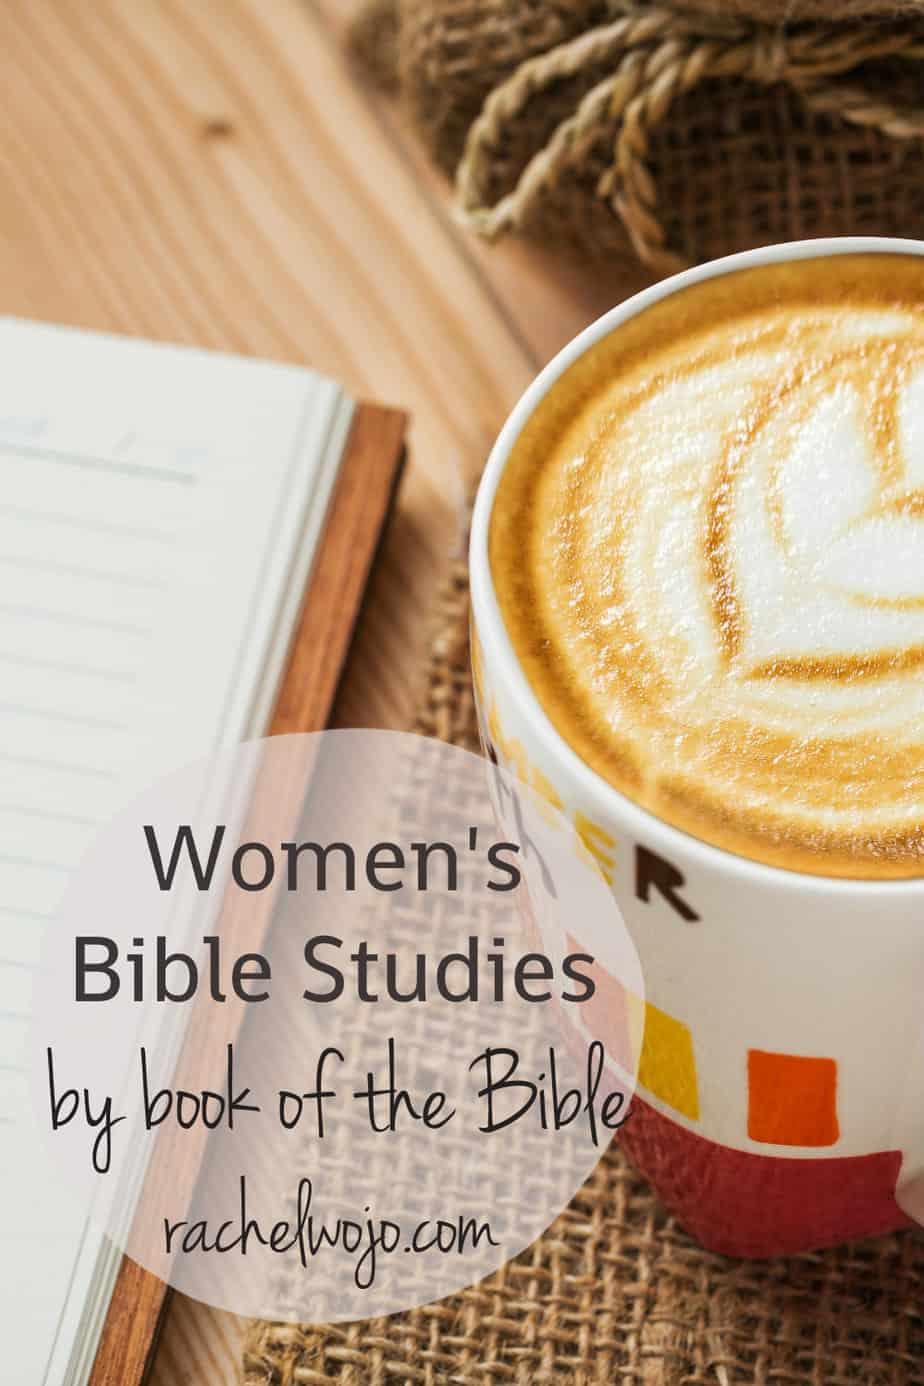 Women's Bible Studies by Book of the Bible - RachelWojo.com